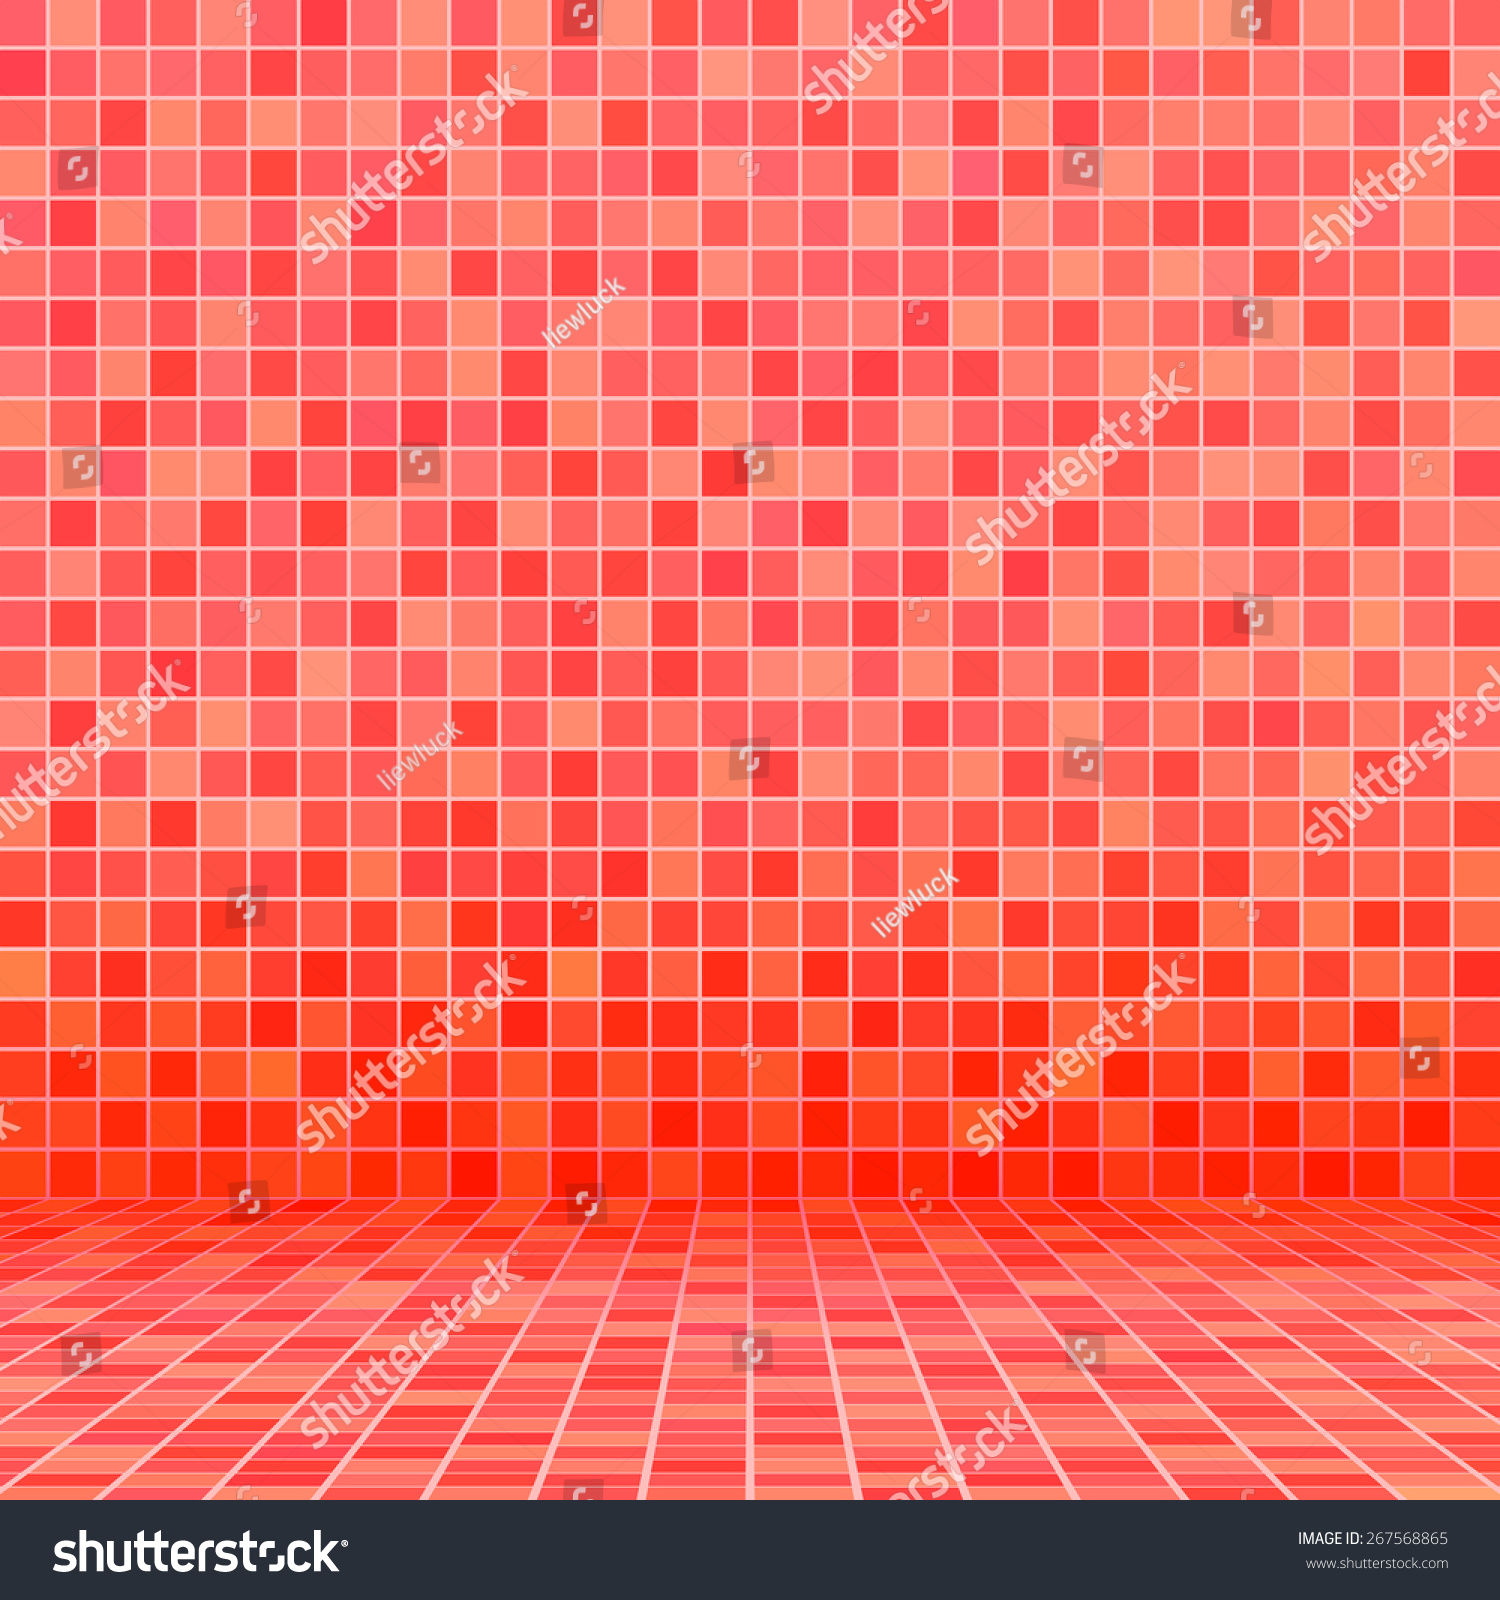 Red Ceramic Tile Mosaic Swimming Pool Stock Vector Royalty Free